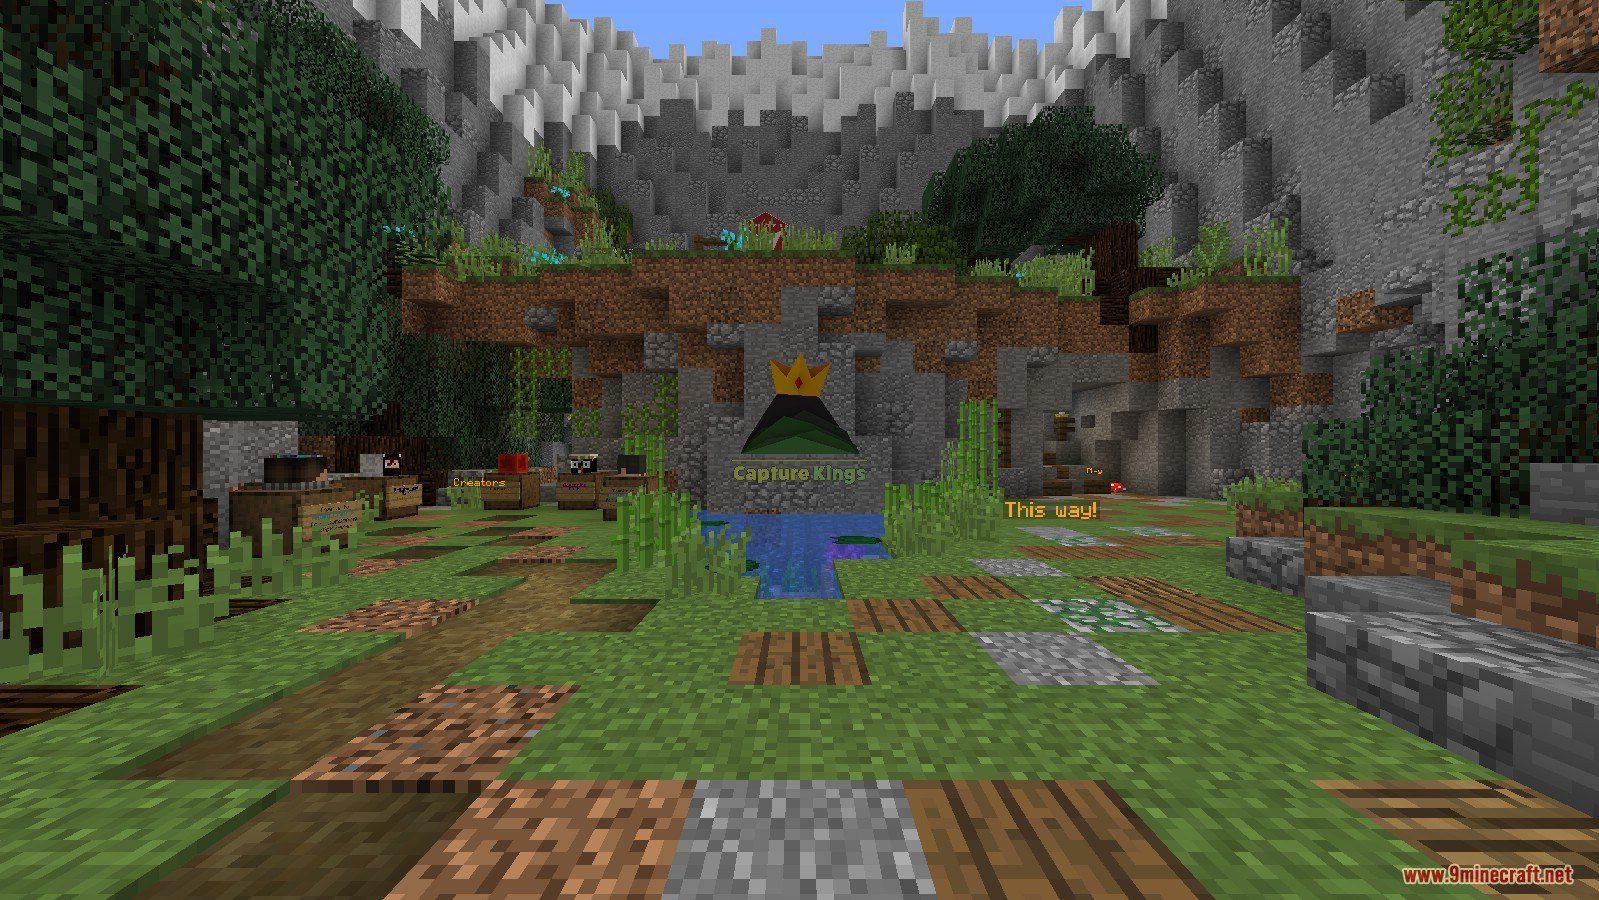 Capture Kings Map Screenshots (1)